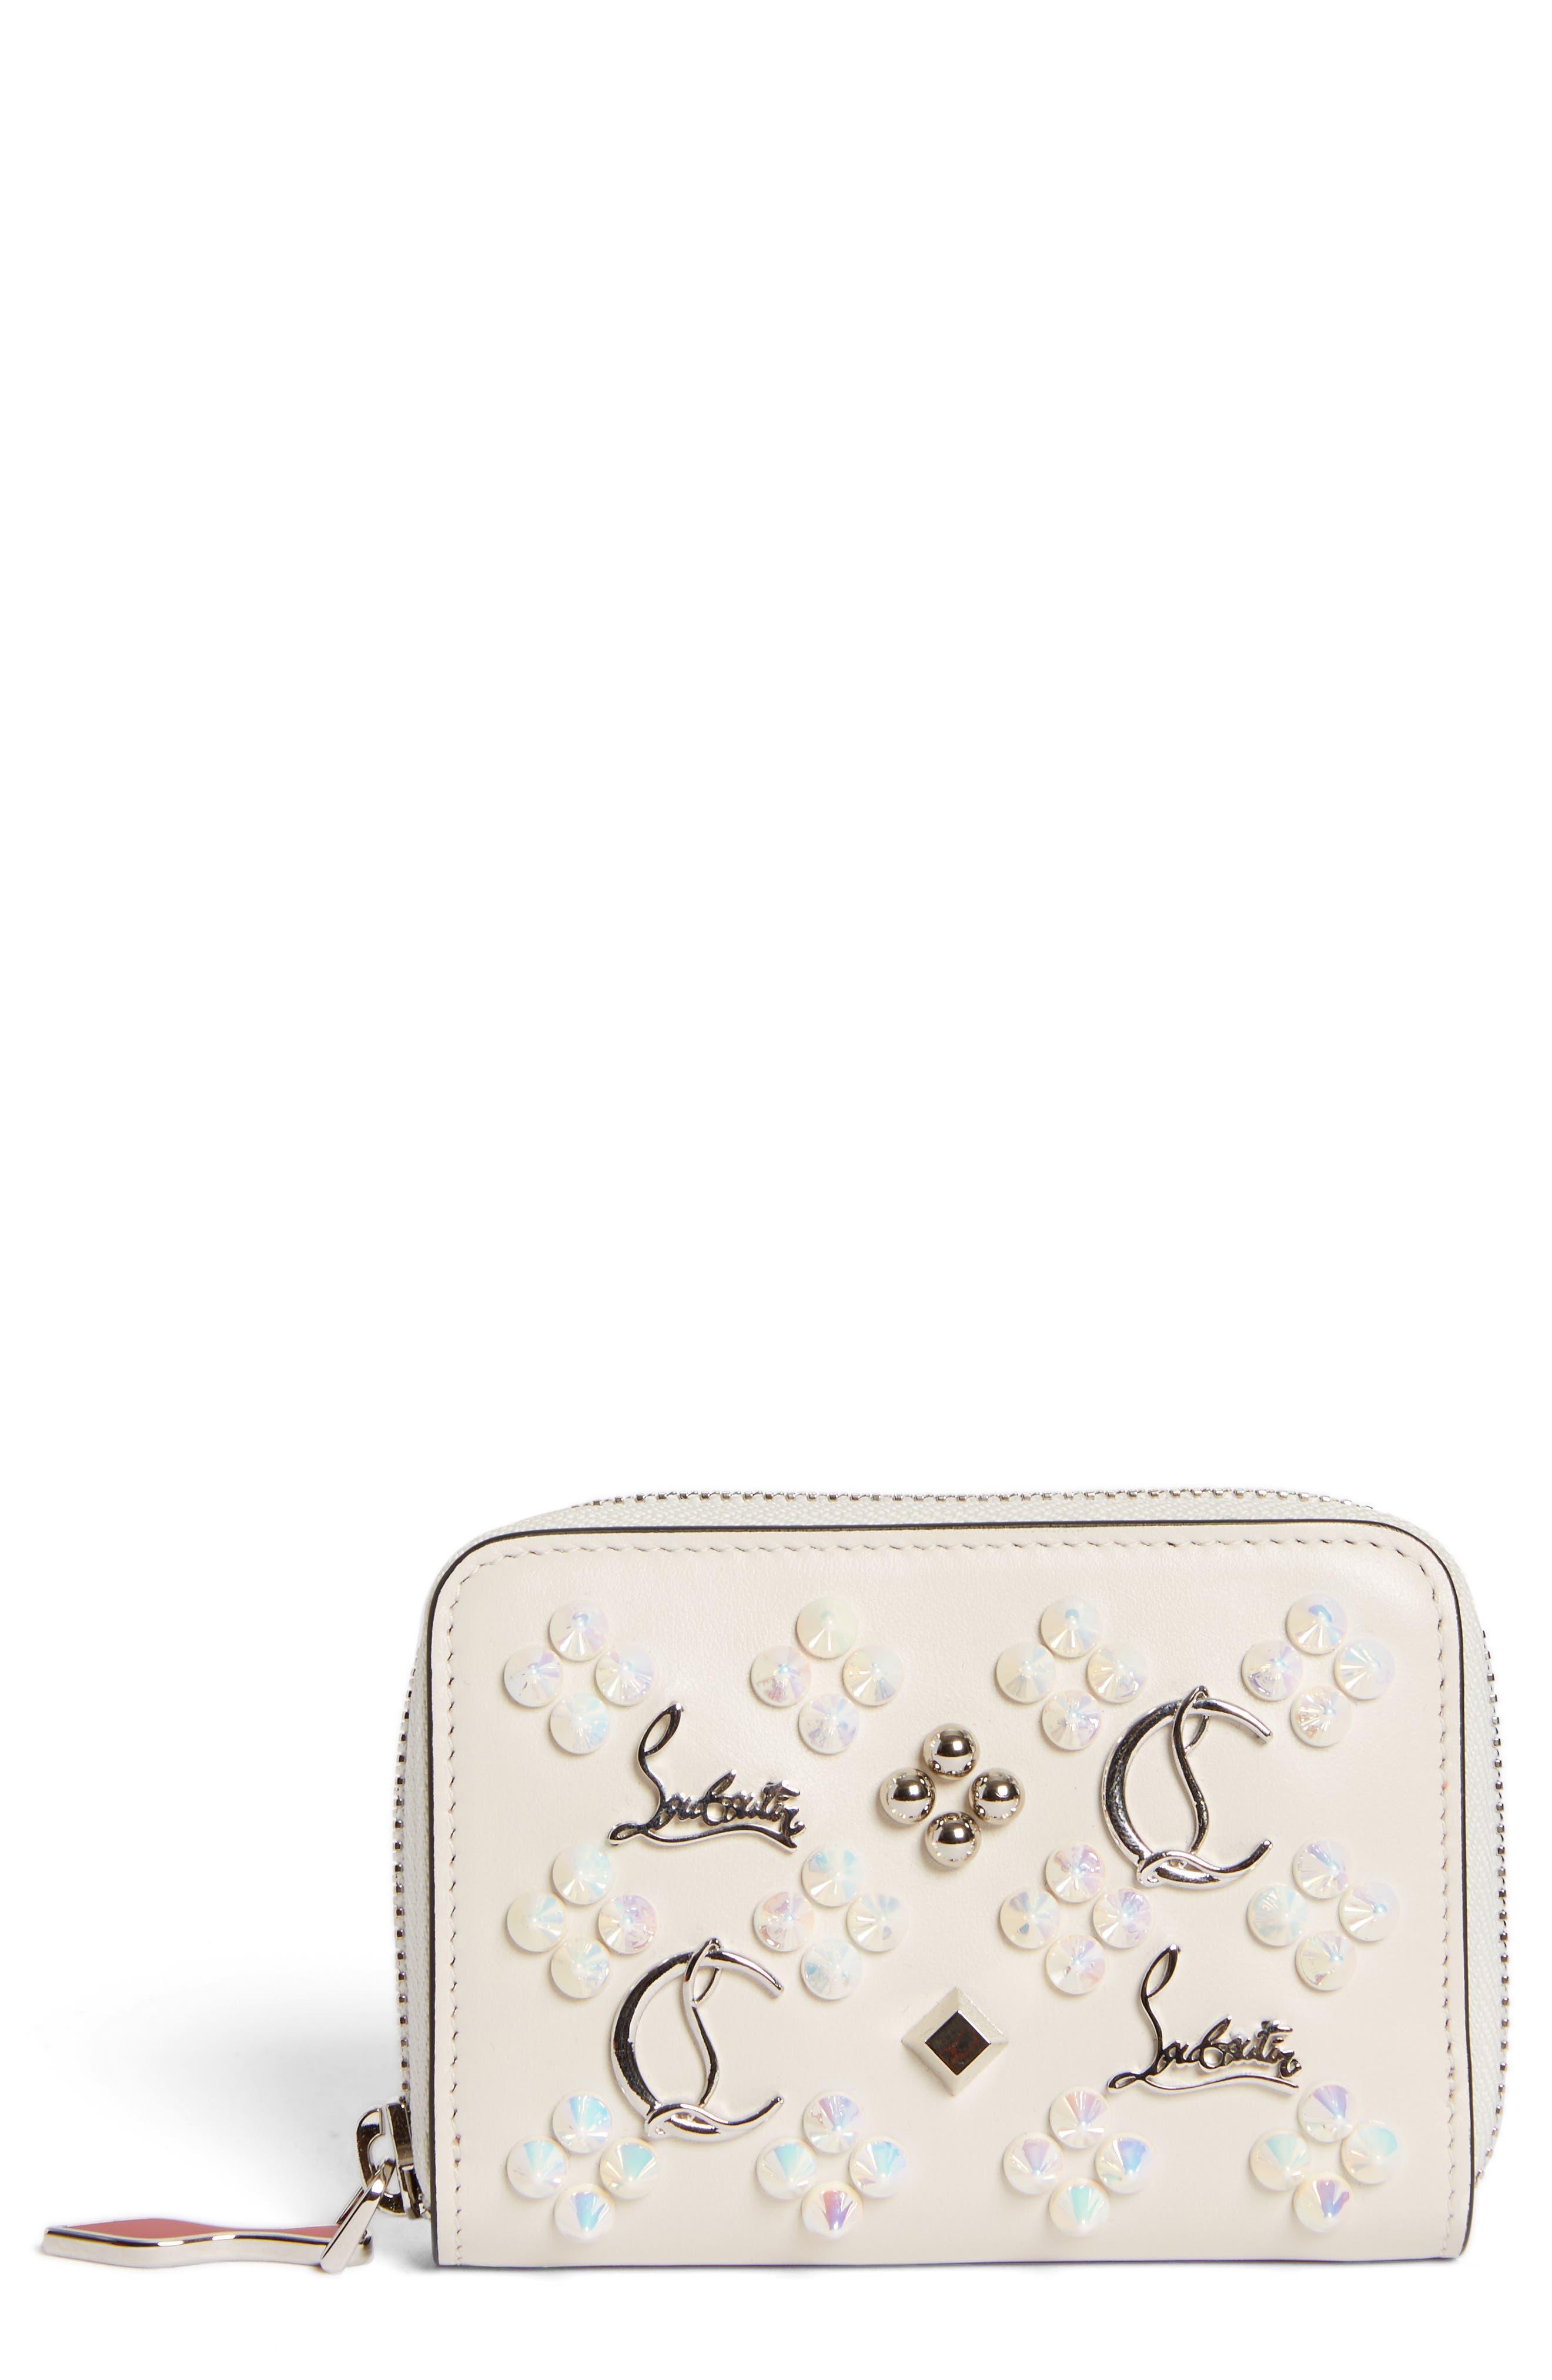 Christian Louboutin Panettone Calfskin Leather Coin Purse